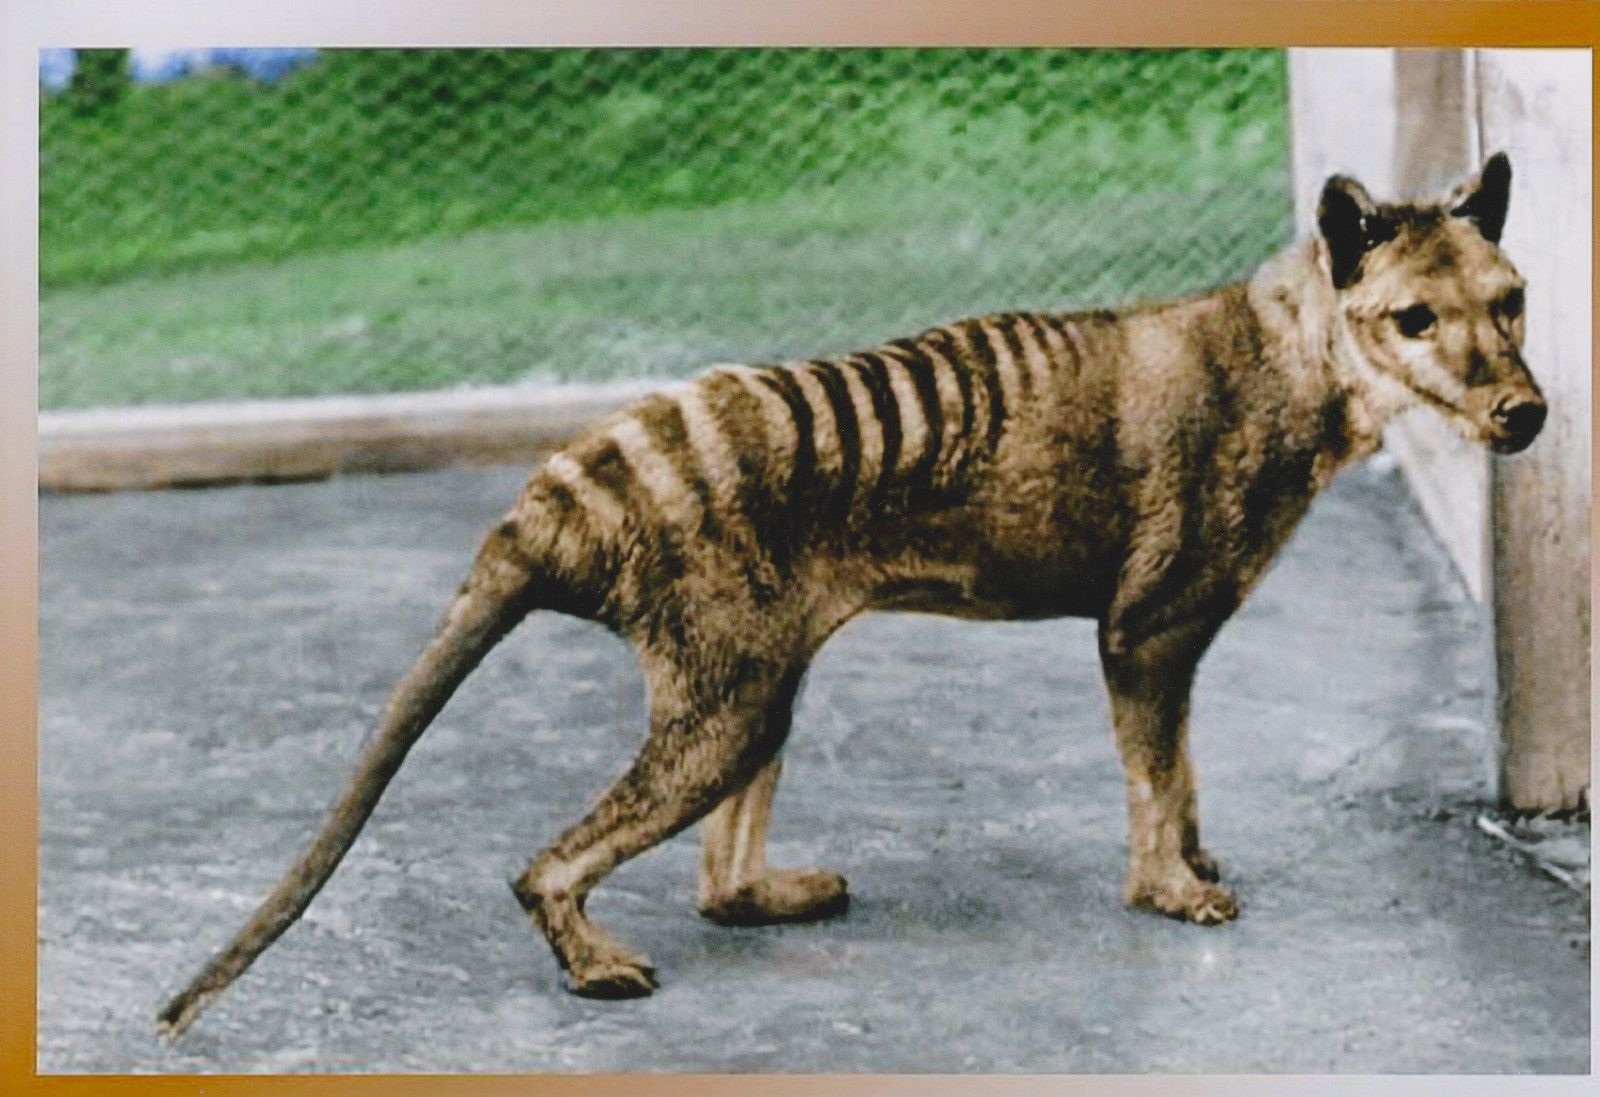 Extinct Tasmanian Tiger Thylacine Animal Australia Postcard Size Photo Print T01 Tasmanian Tiger Extinct Animals Thylacine